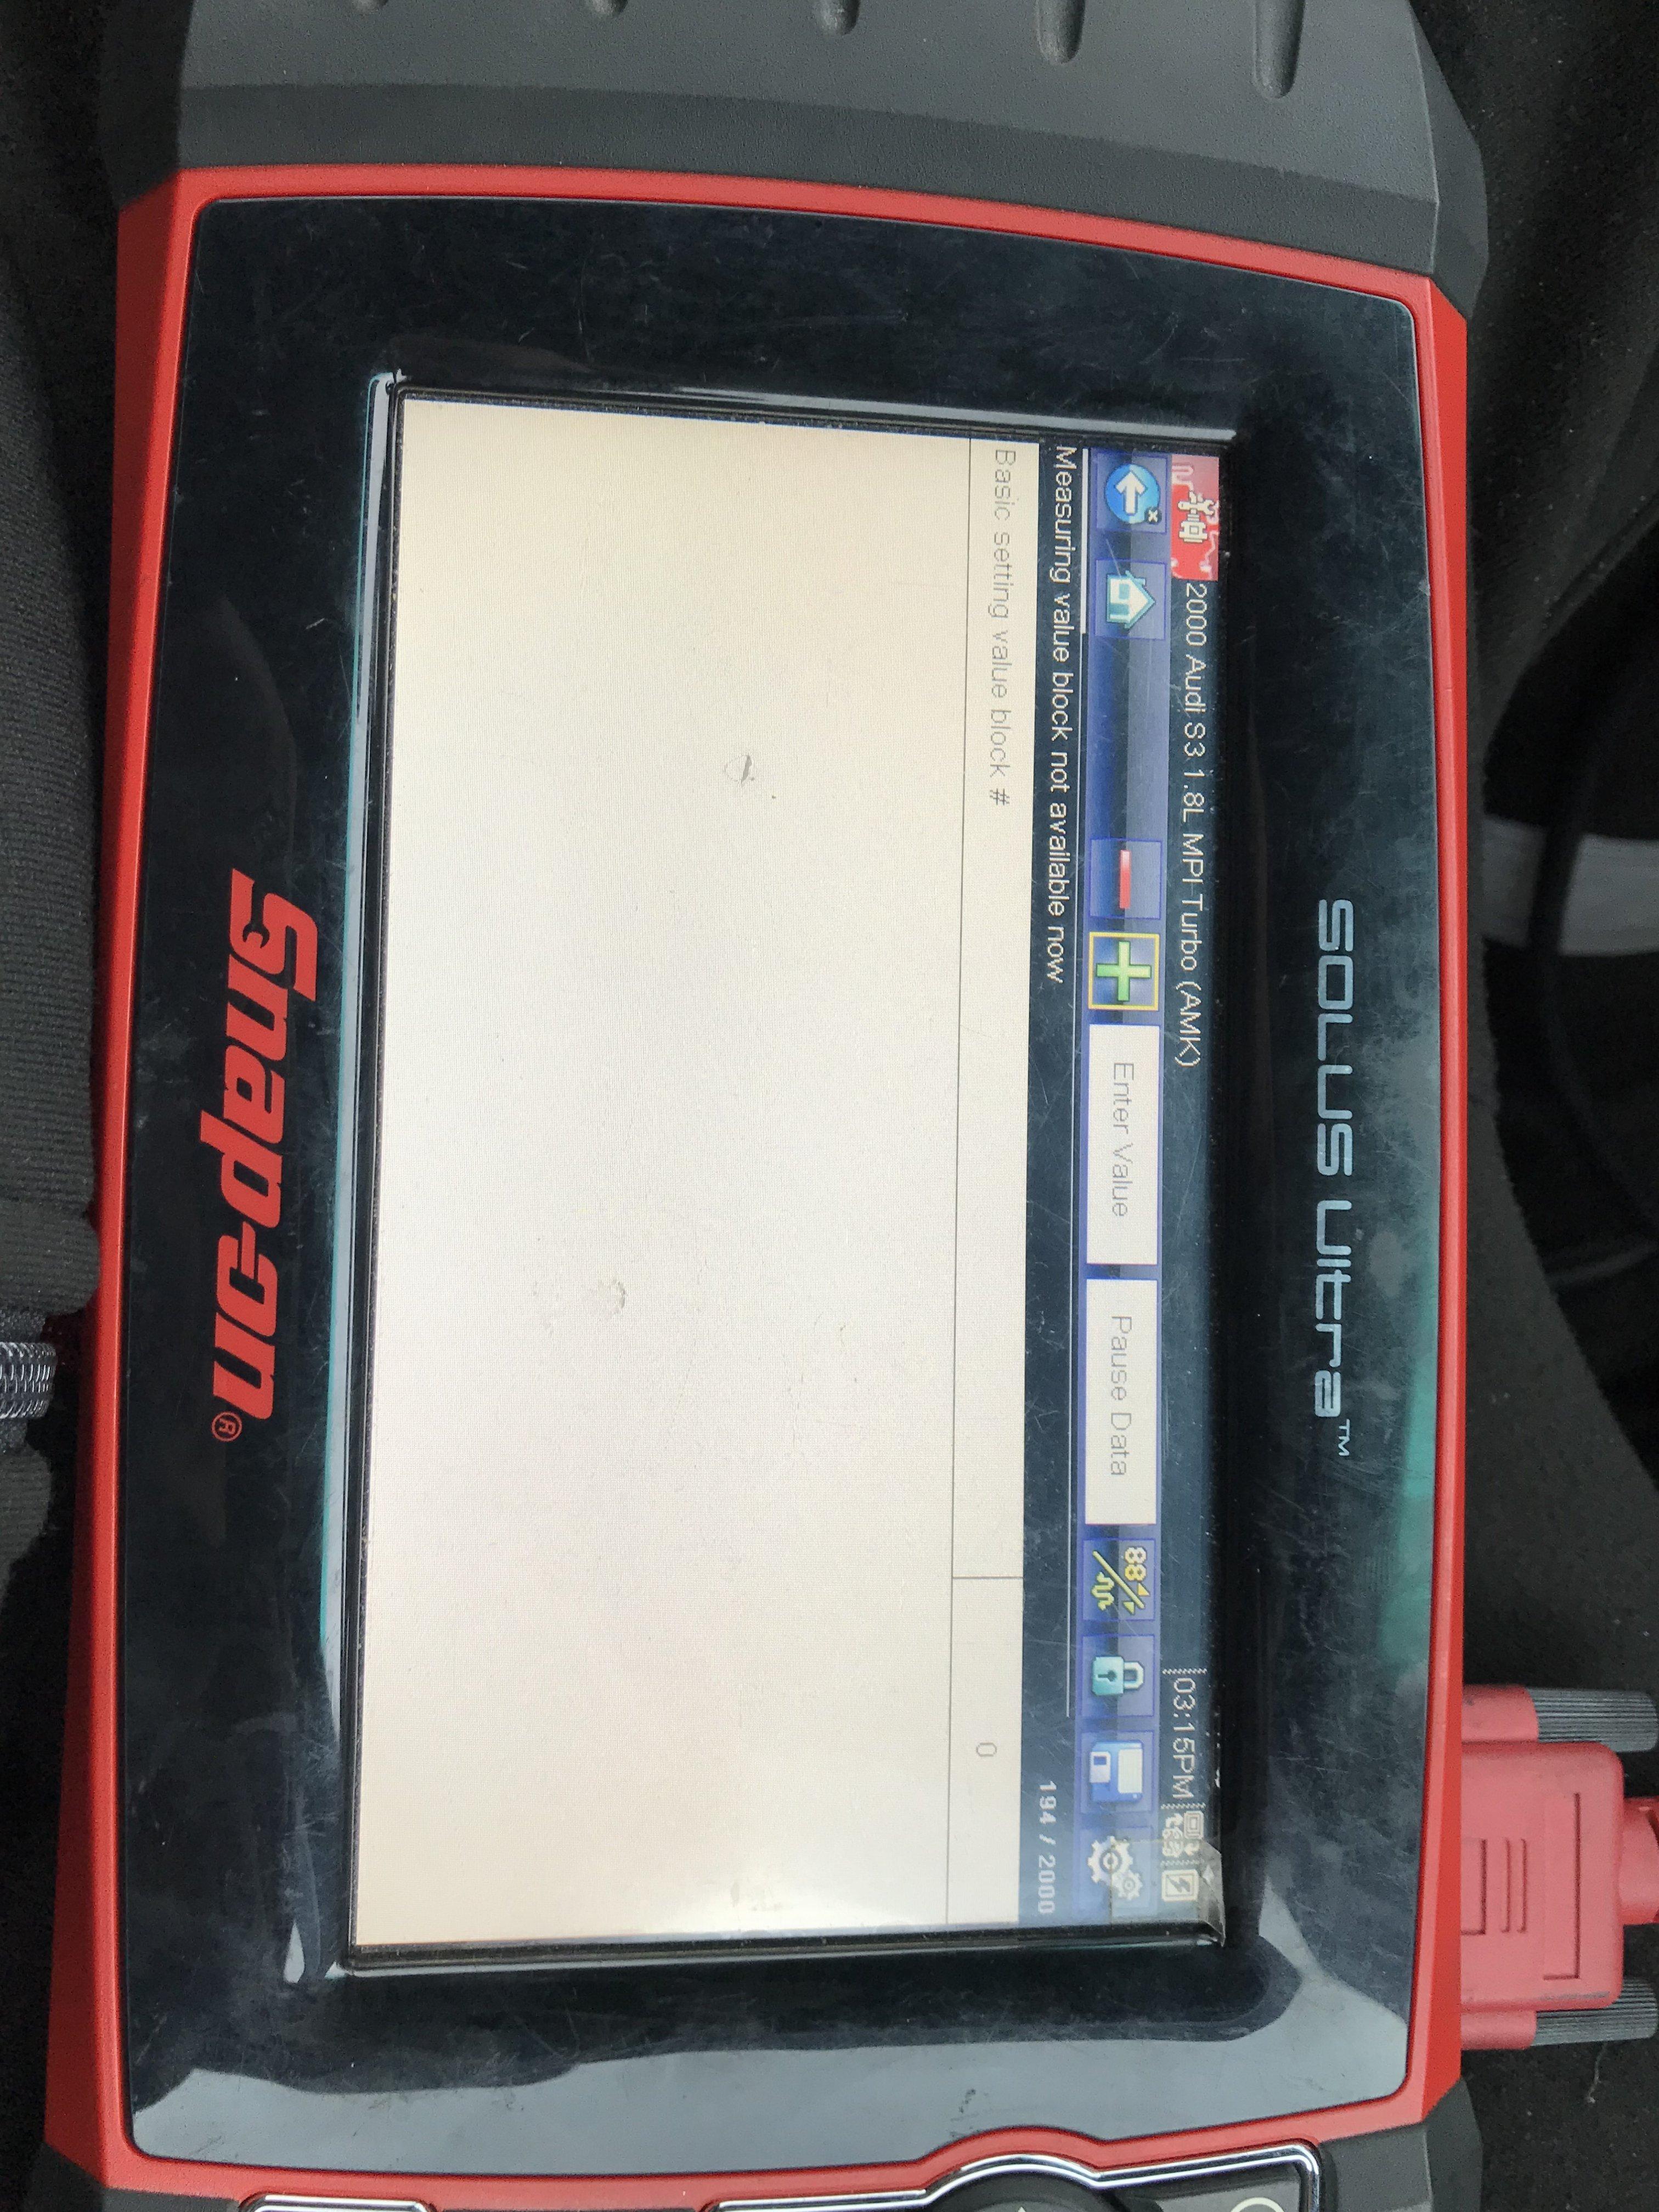 S3 8L can't calibrate steering angle sensor | Audi-Sport net